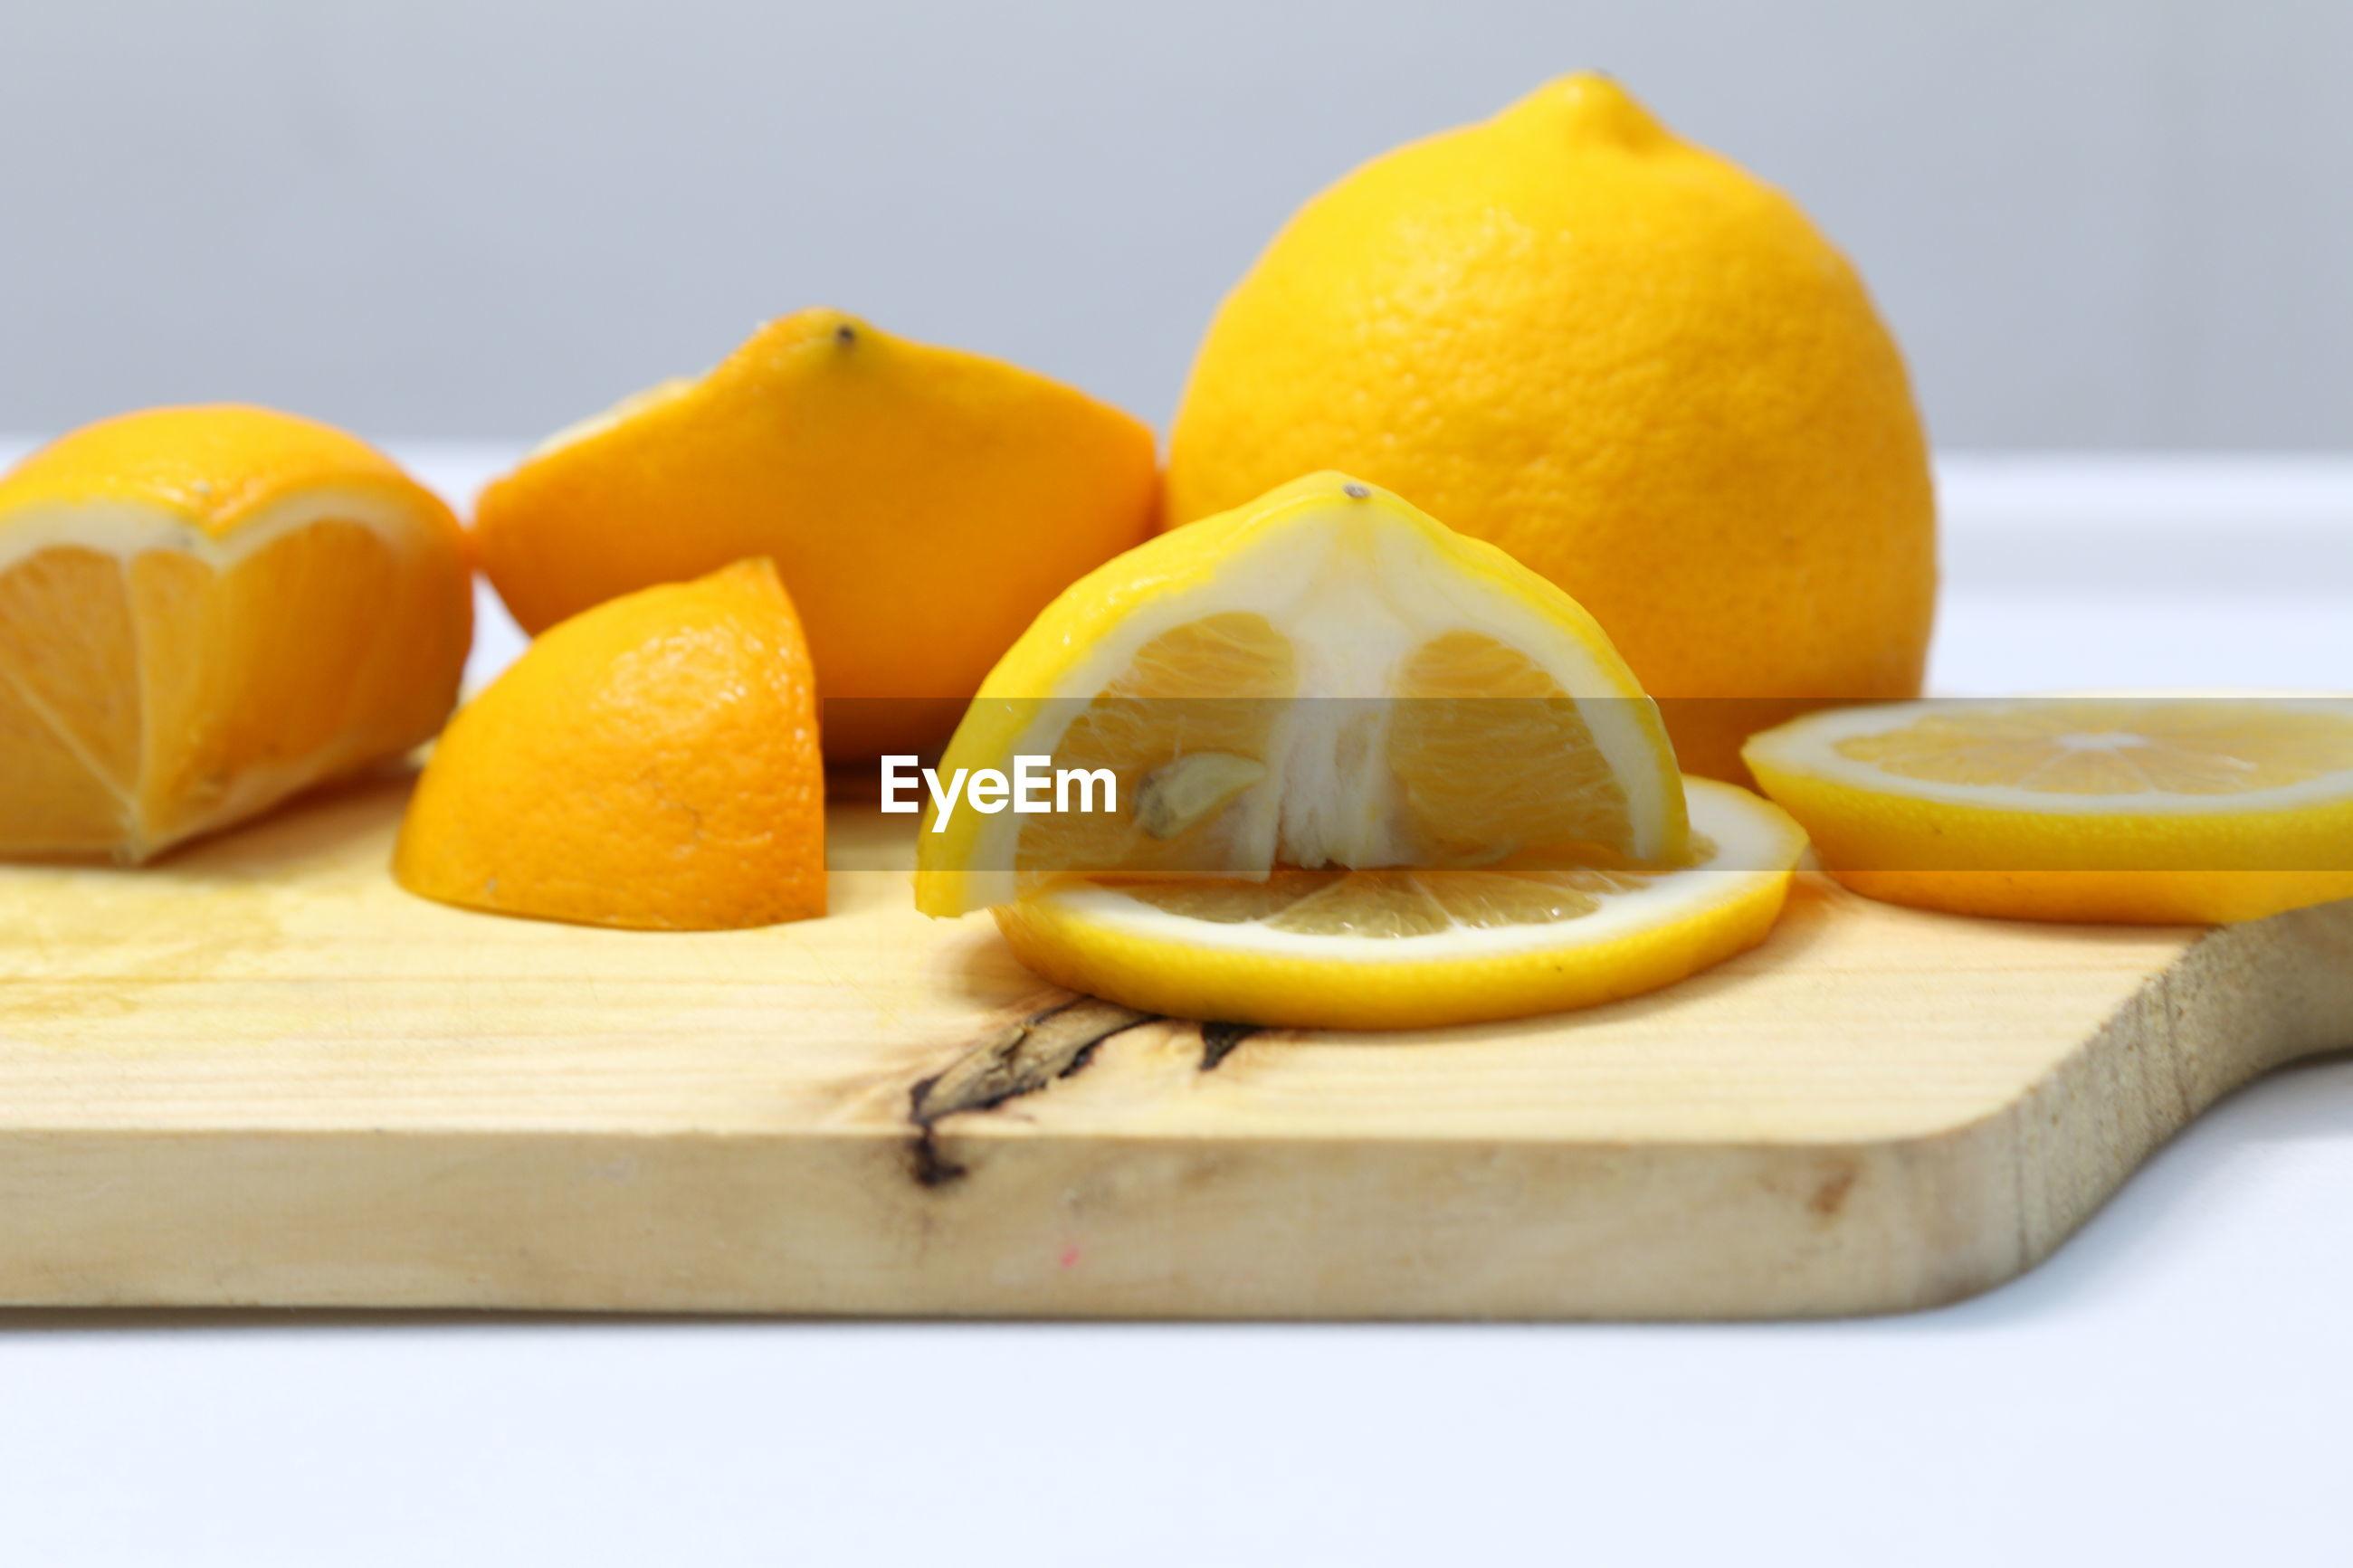 Close-up of lemons on cutting board